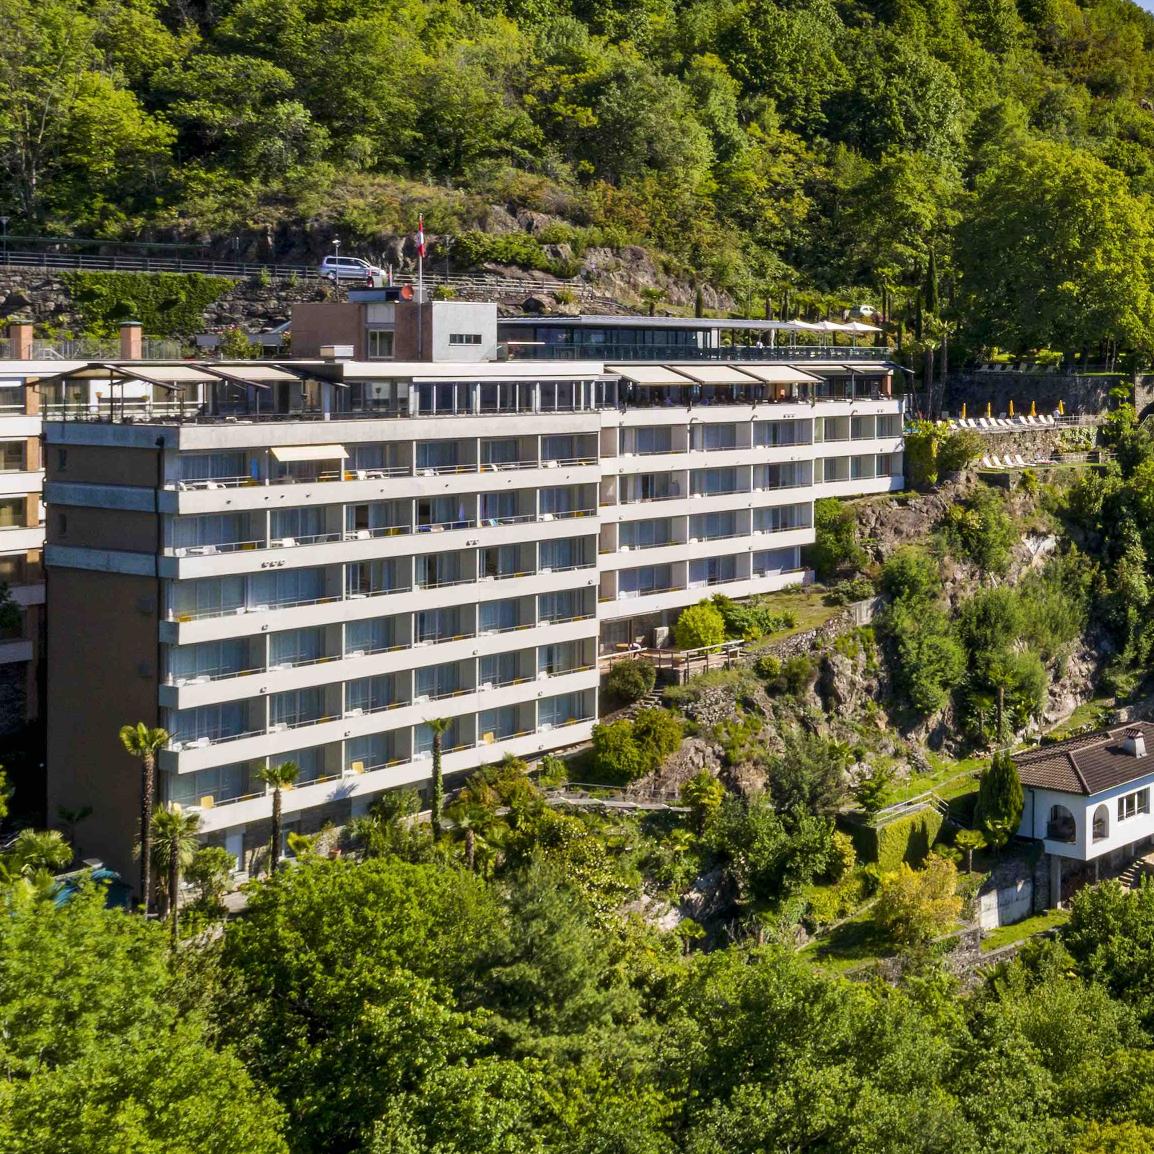 Hotel Casa Beato Berno, Ascona